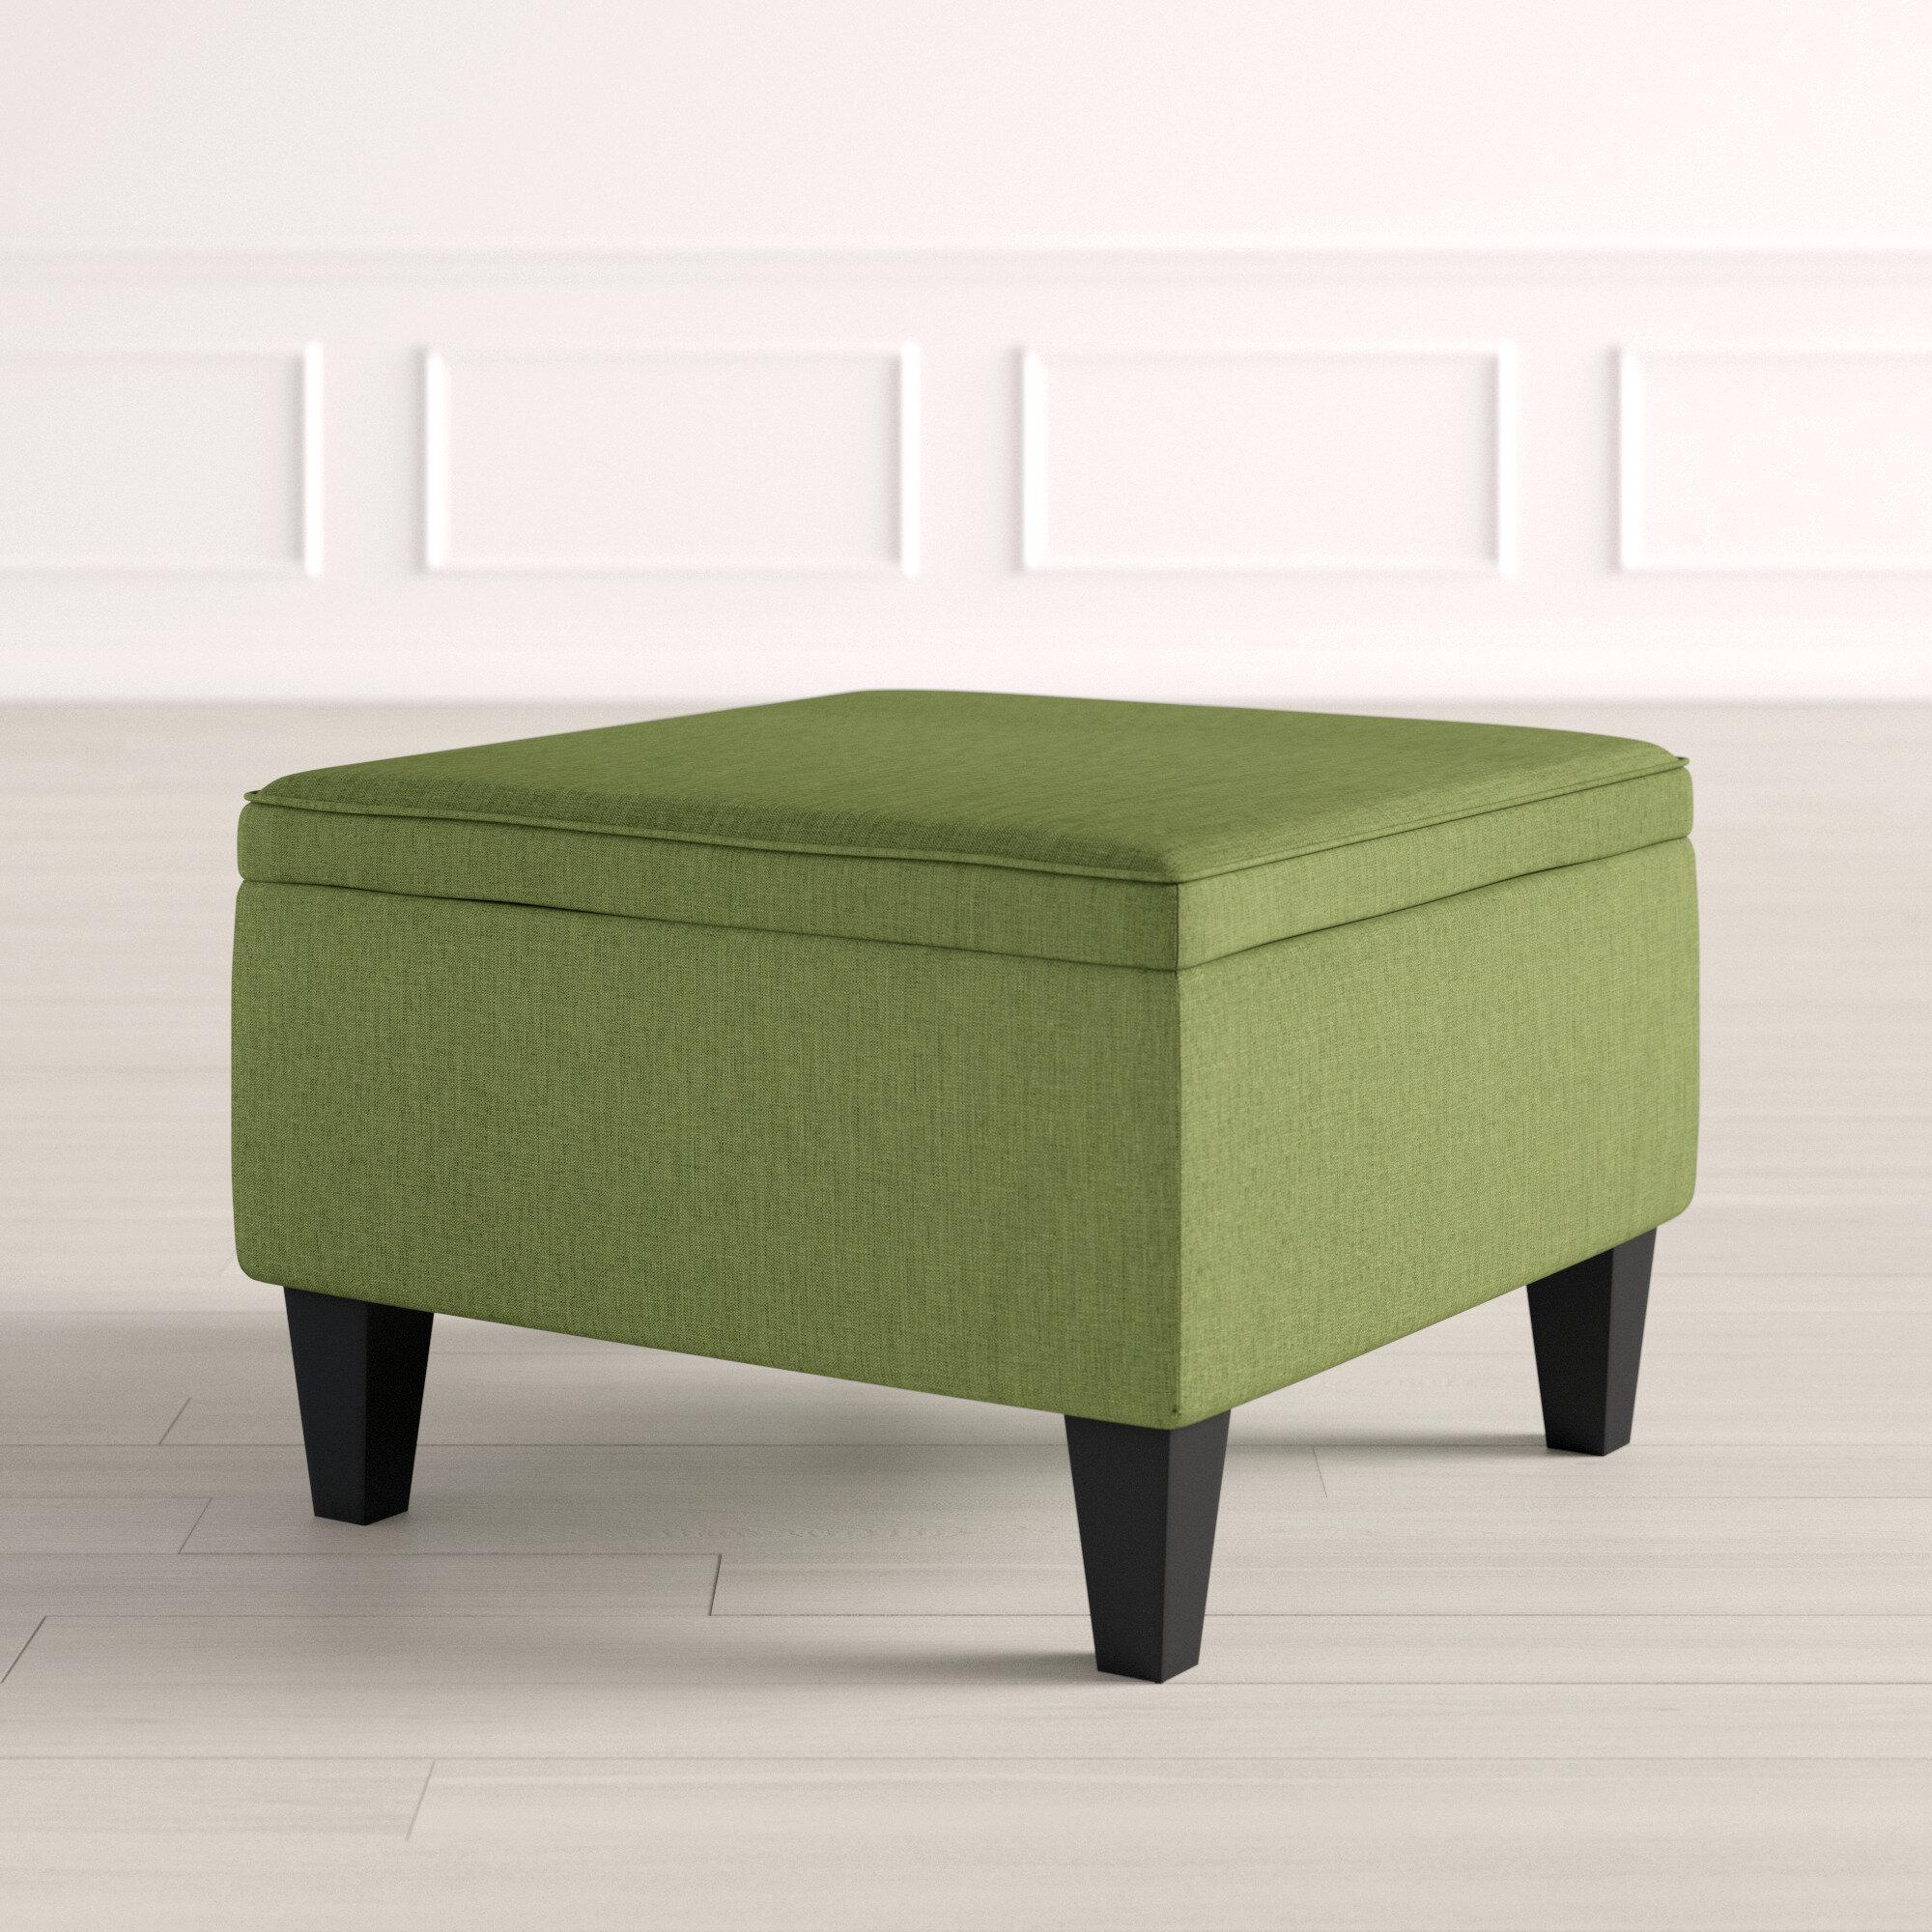 Tremendous Perseus Storage Ottoman Squirreltailoven Fun Painted Chair Ideas Images Squirreltailovenorg